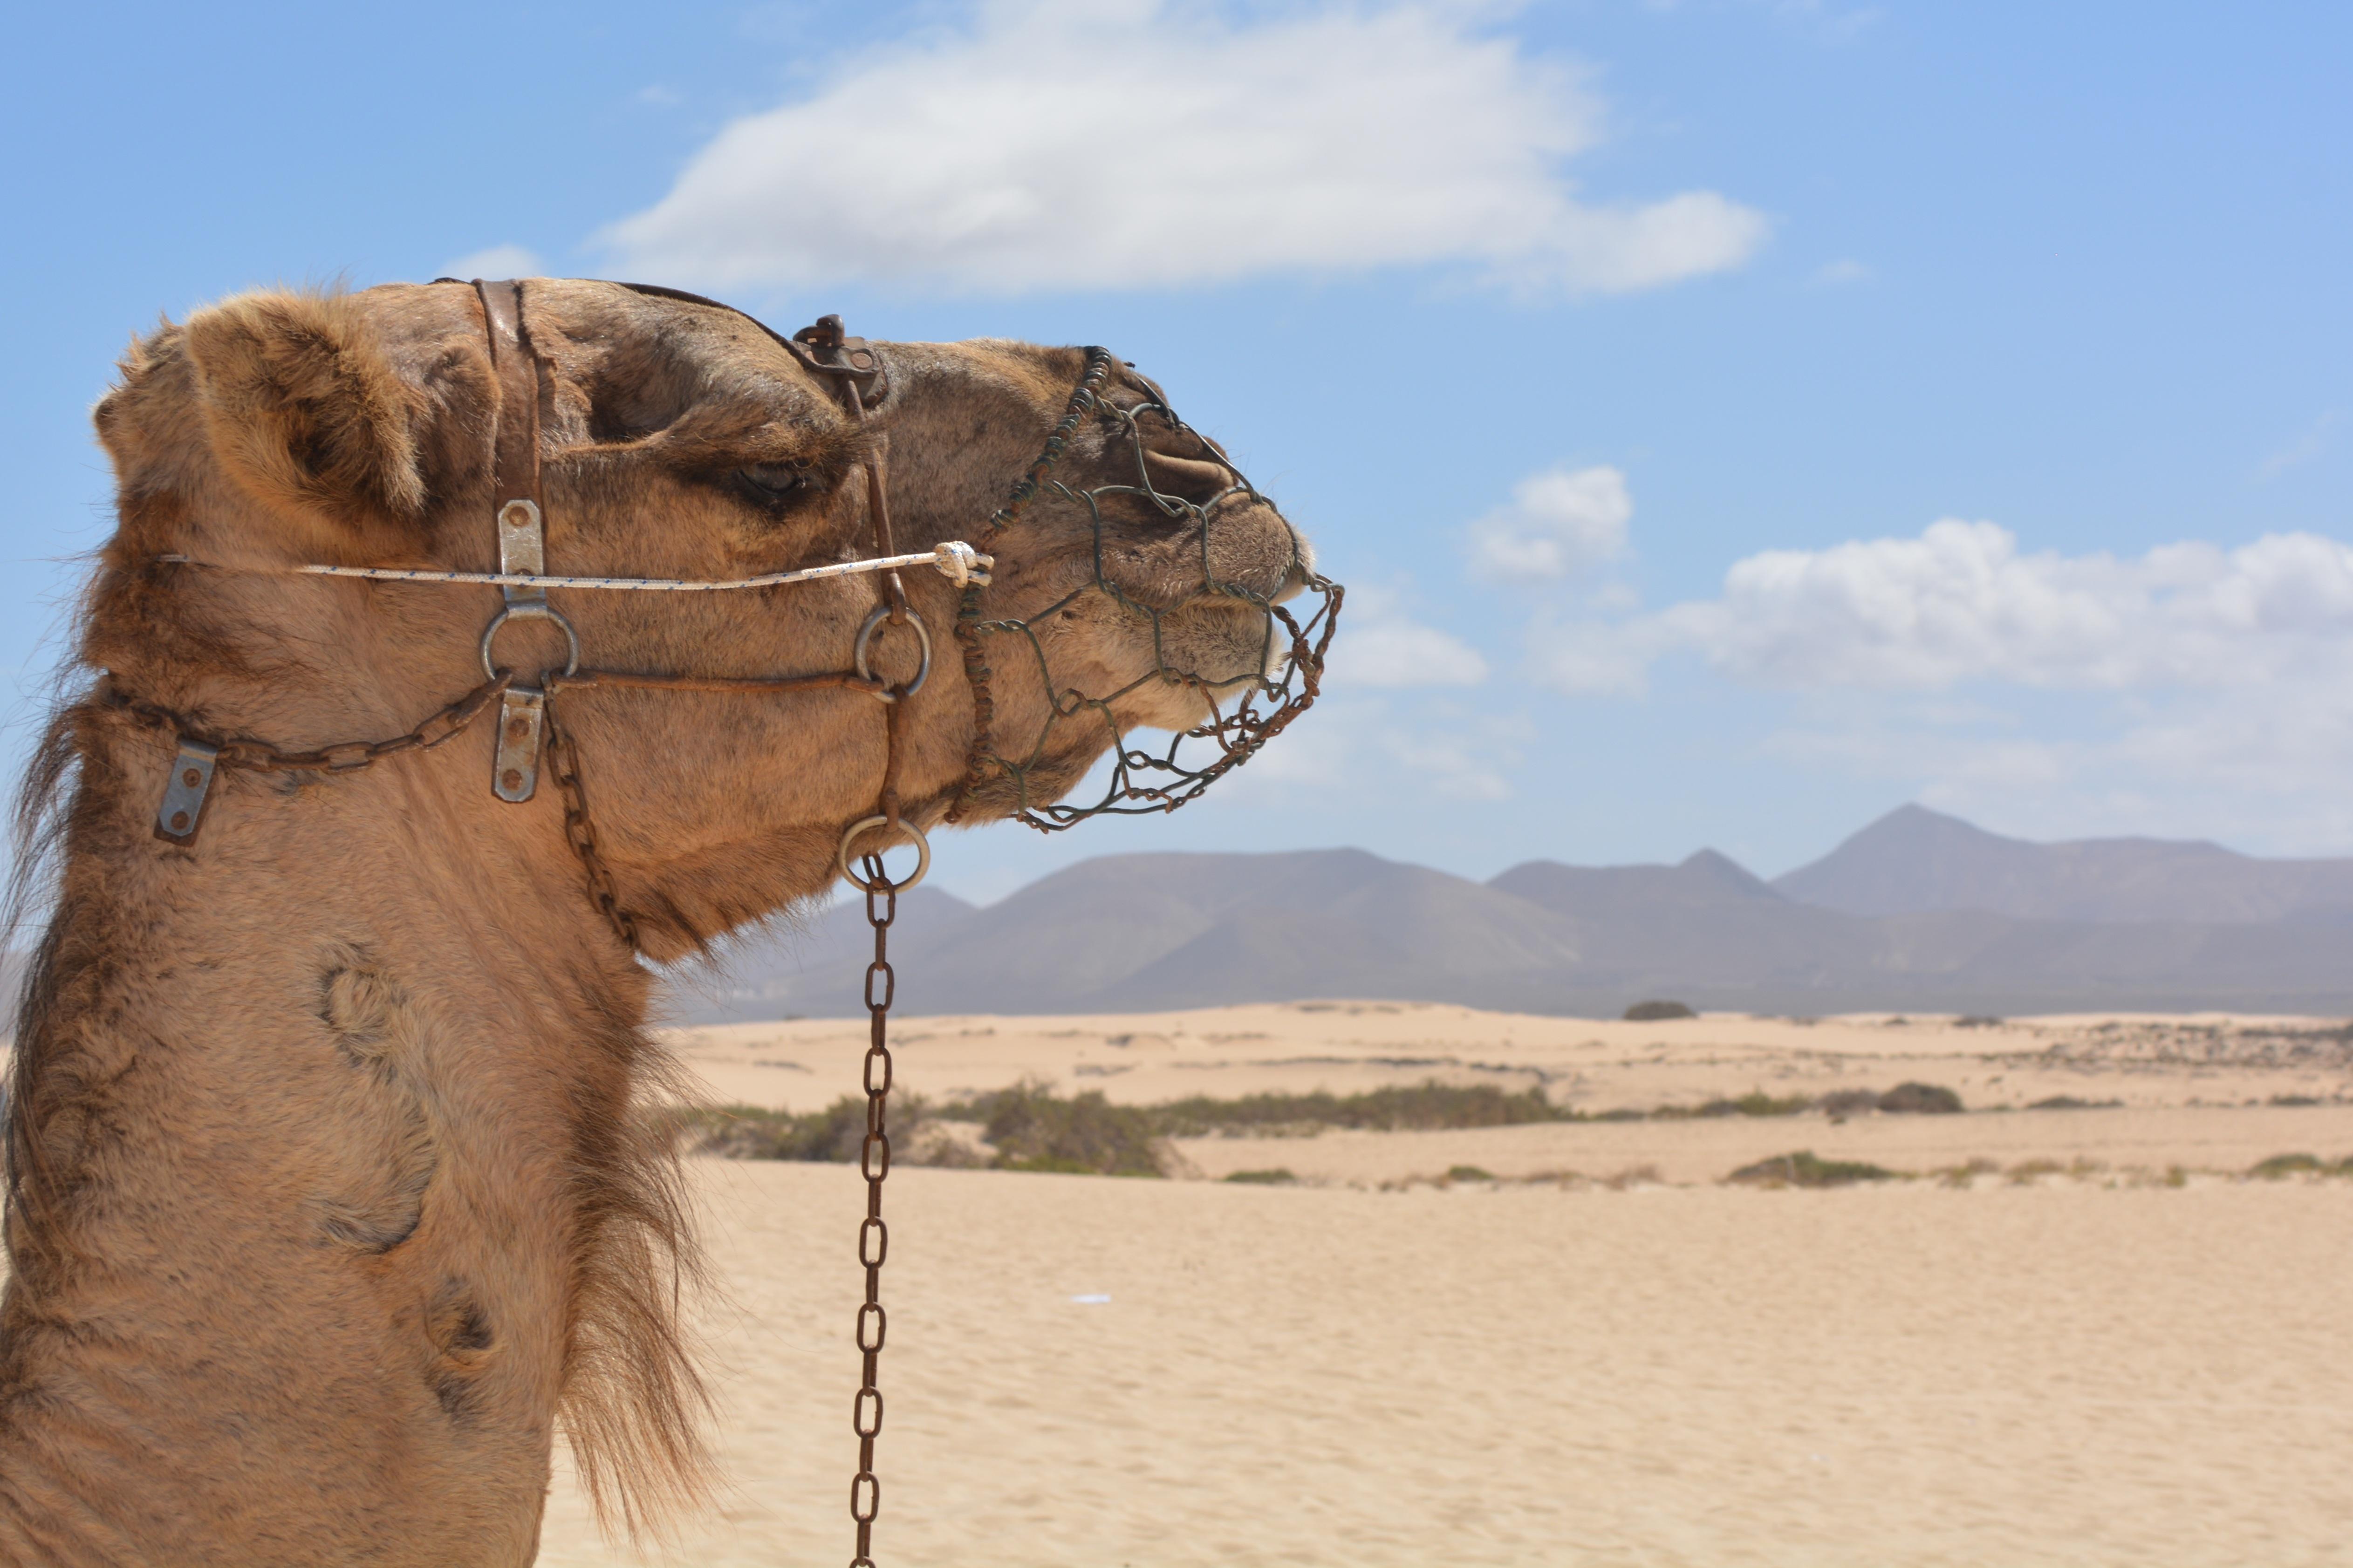 Free Images : landscape, sand, desert, animal, travel ...